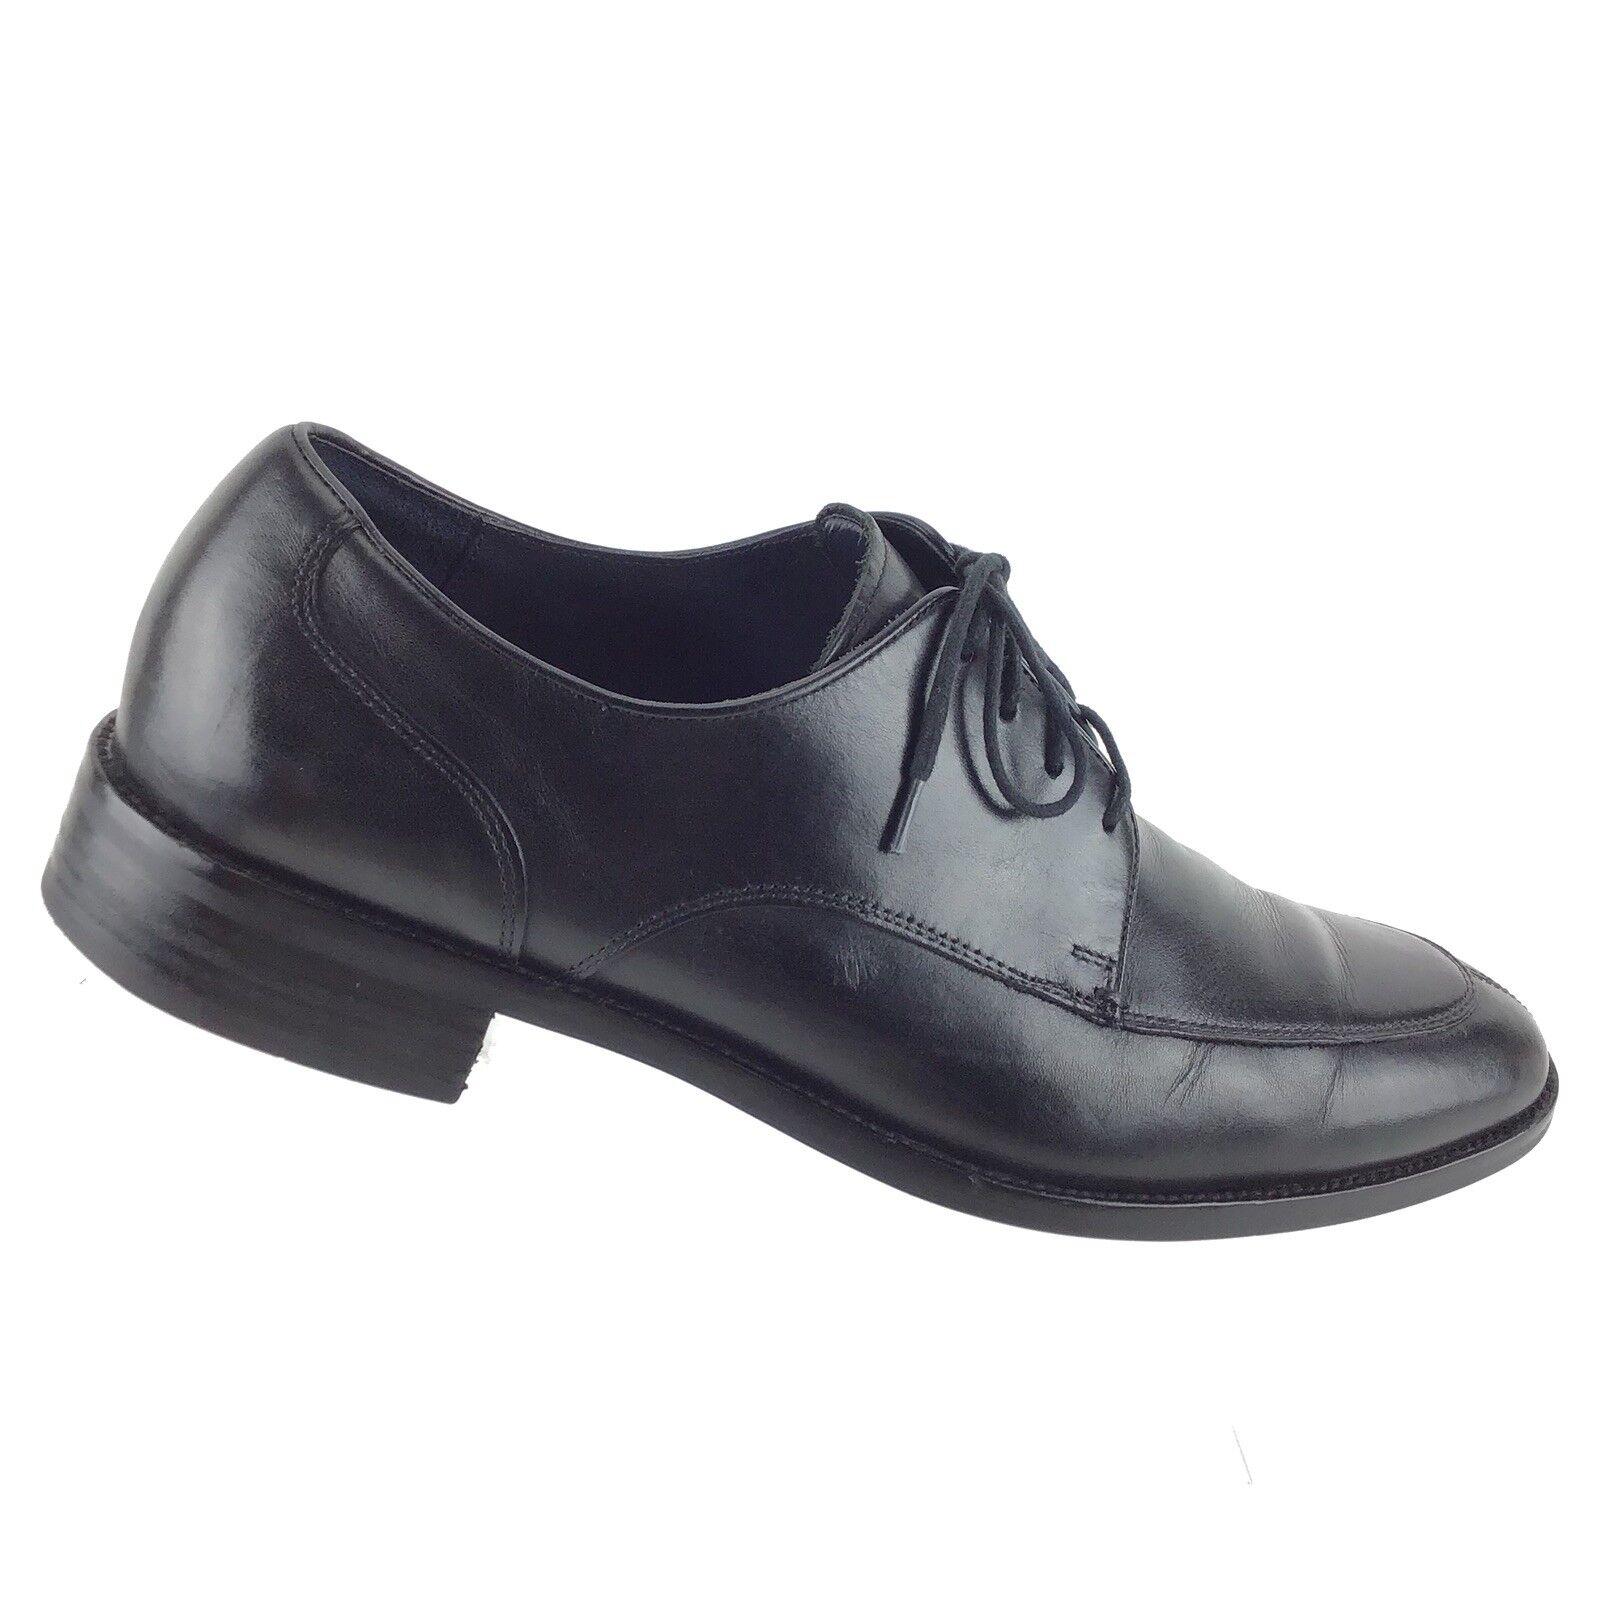 Cole Haan Grand O.S. Men's Black Apron Split Toe Oxford Dress Casual Shoes R6S4